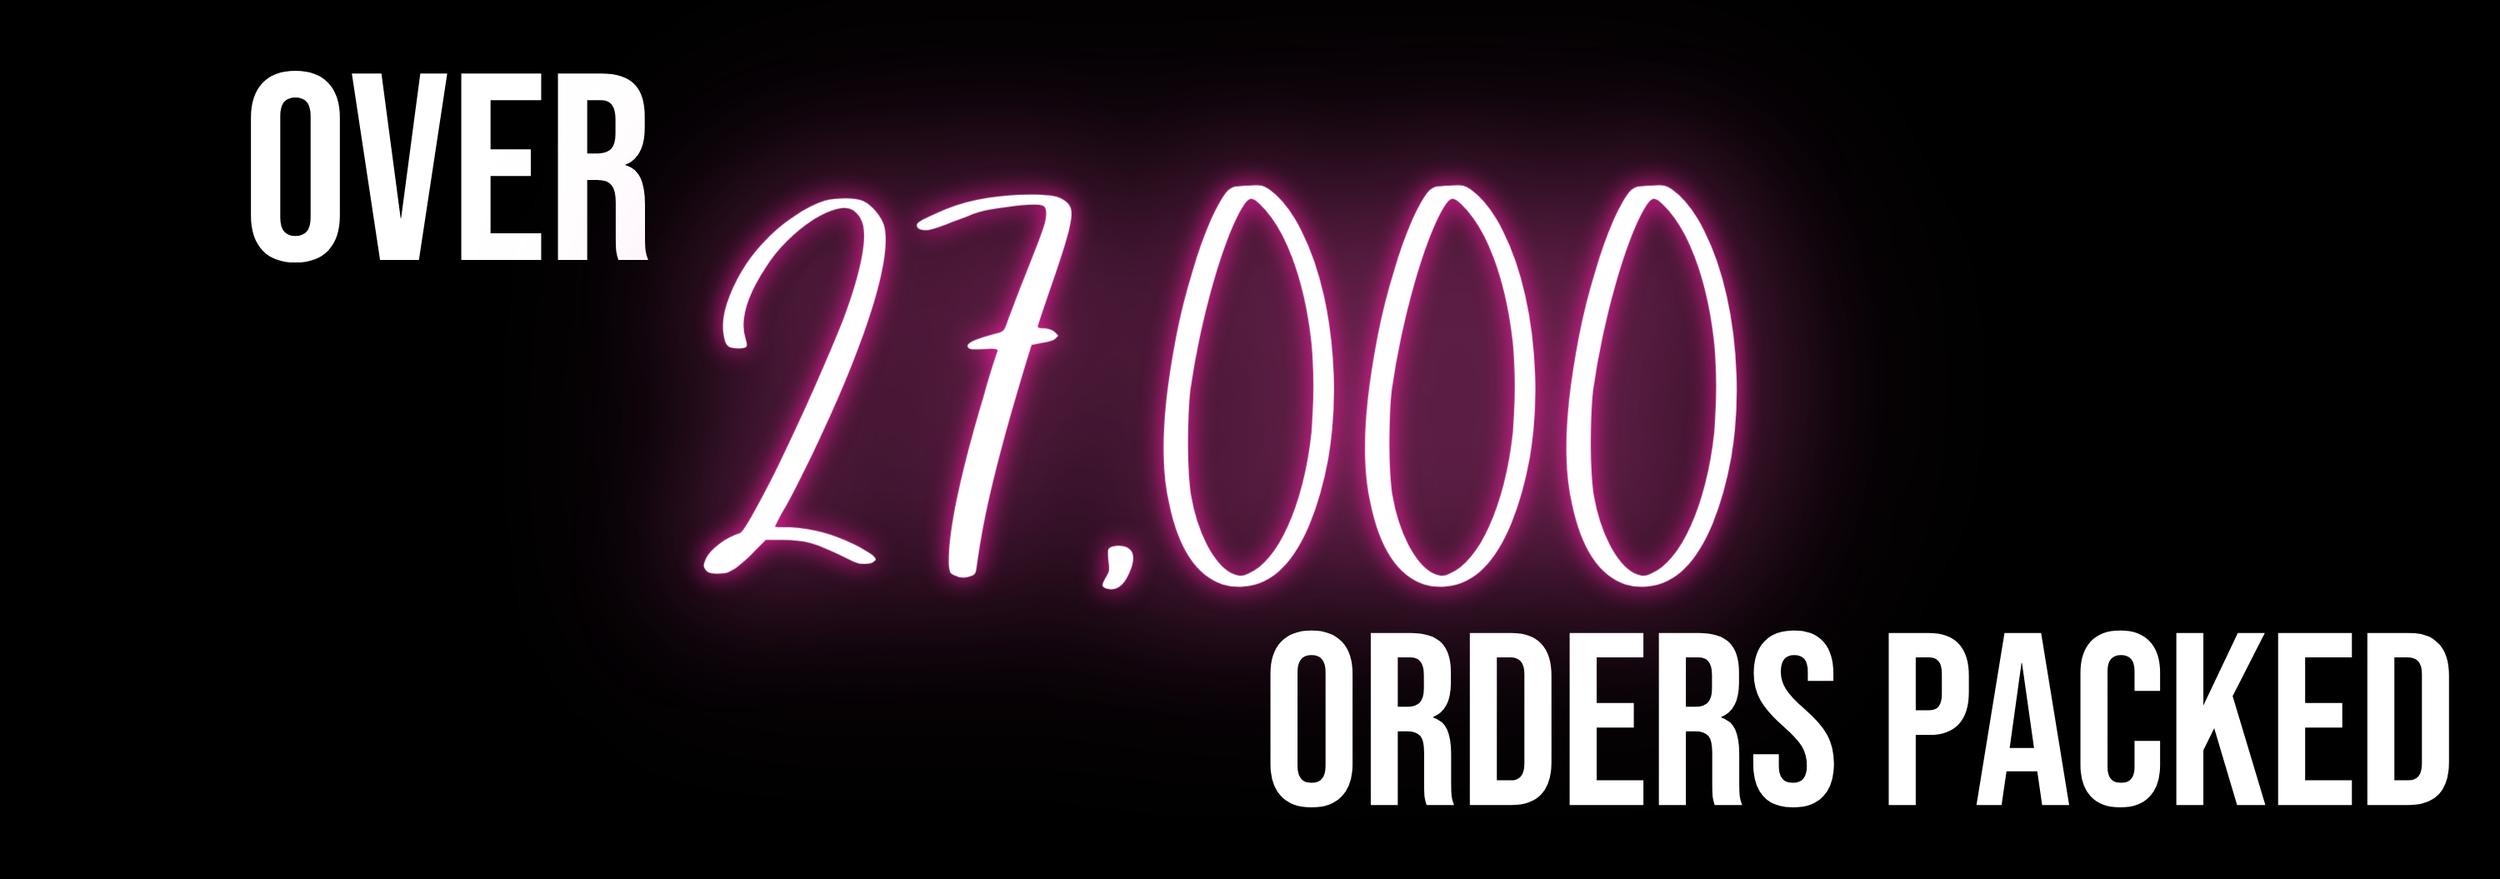 27000